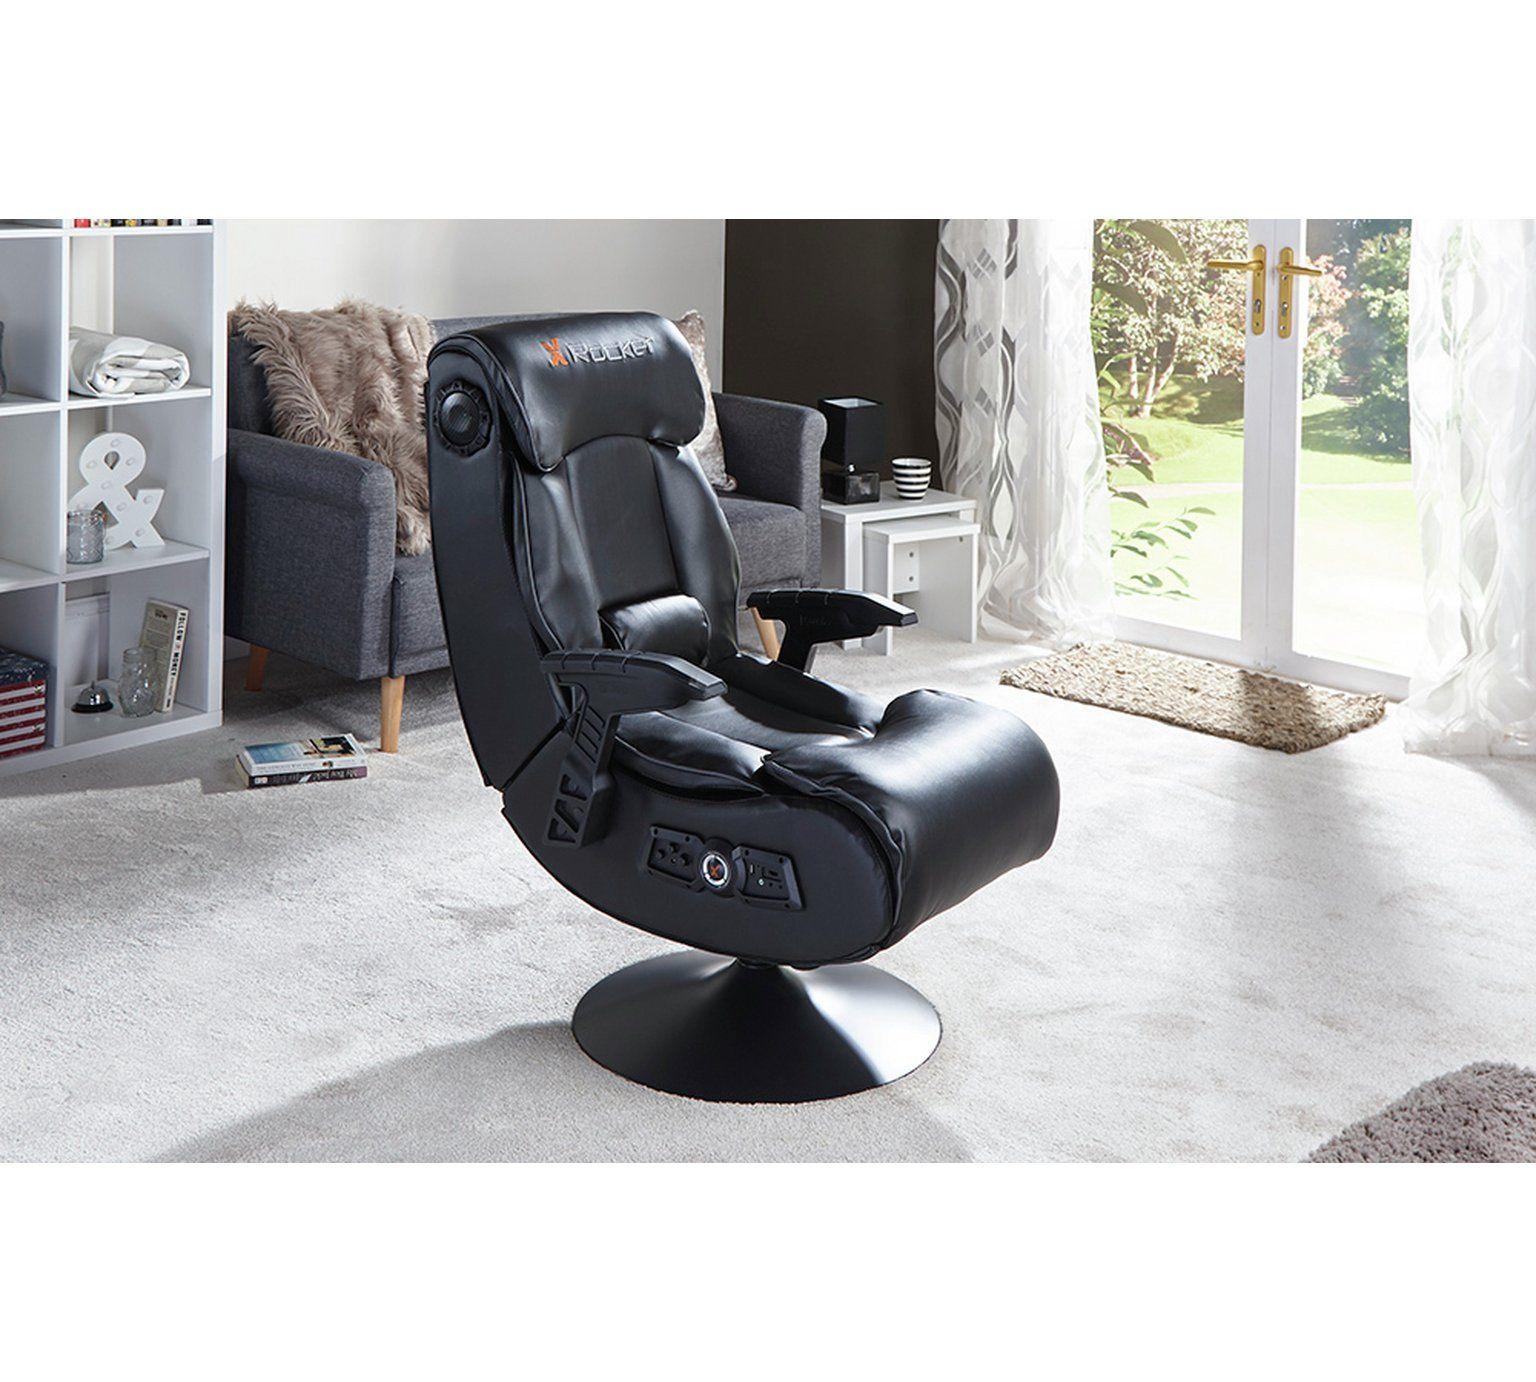 X-Rocker Elite Pro Gaming Chair - PS4 & Xbox Oneby X Rocker £149.99 @ Argos